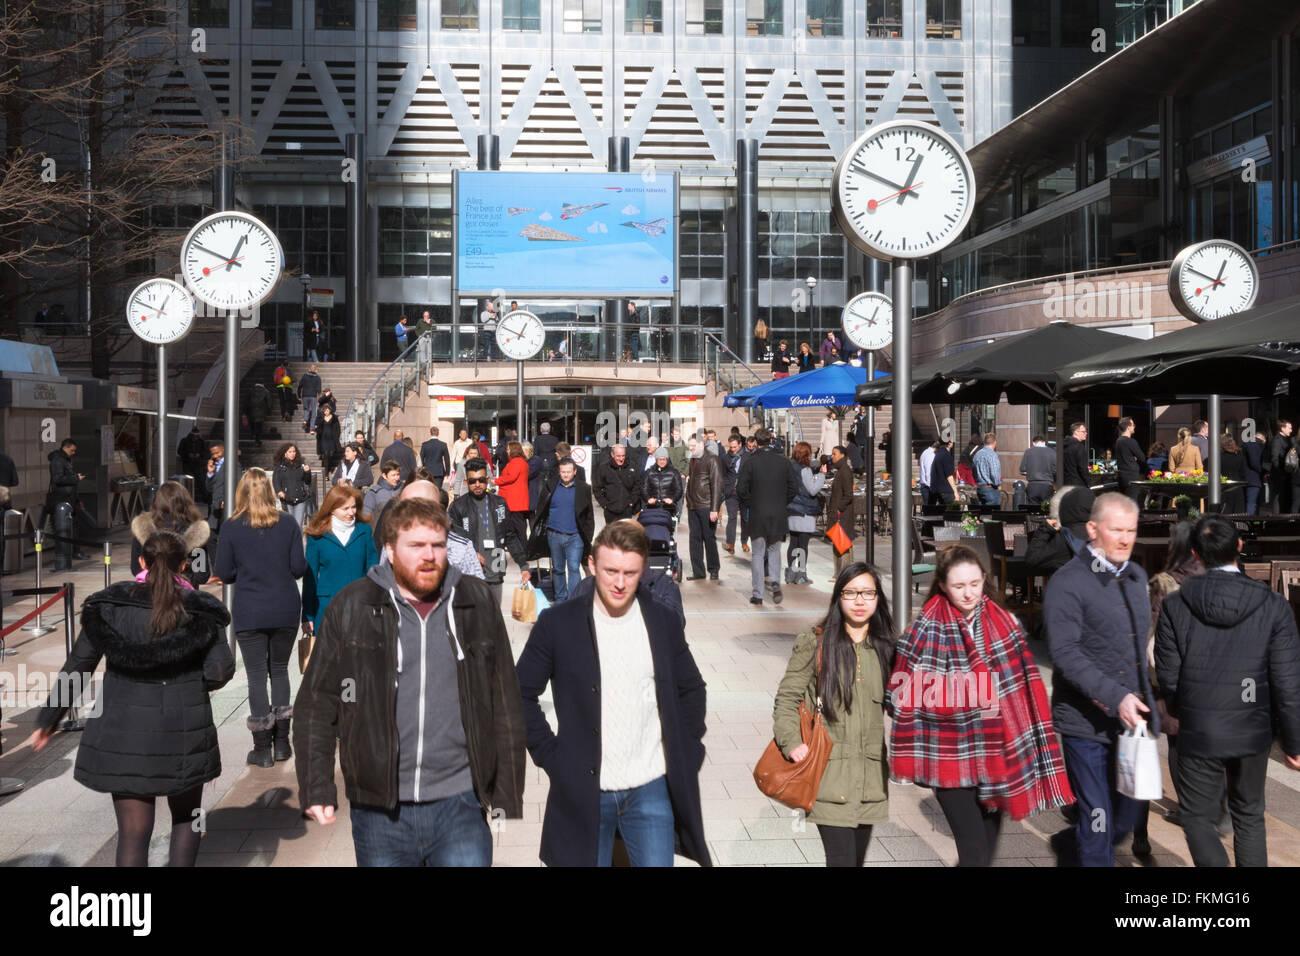 People walking through the clocks, Canary Wharf London UK - Stock Image